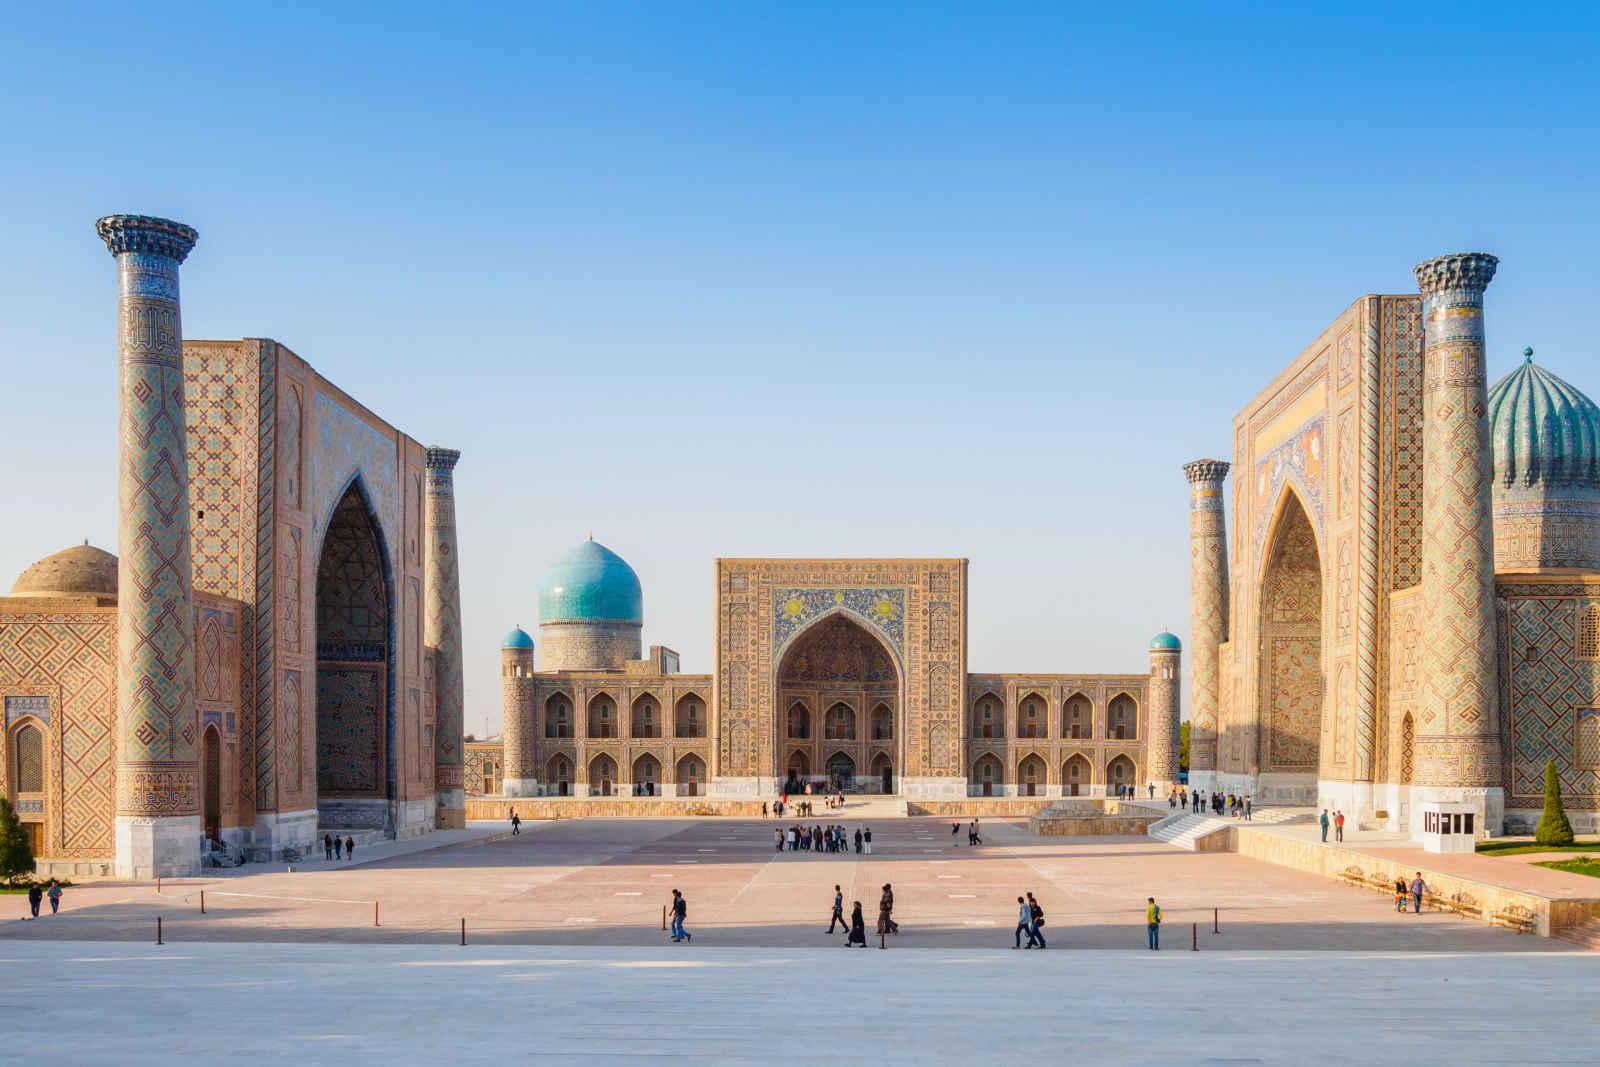 Ouzbékistan - Circuit Majestueuses Cités Ouzbeks